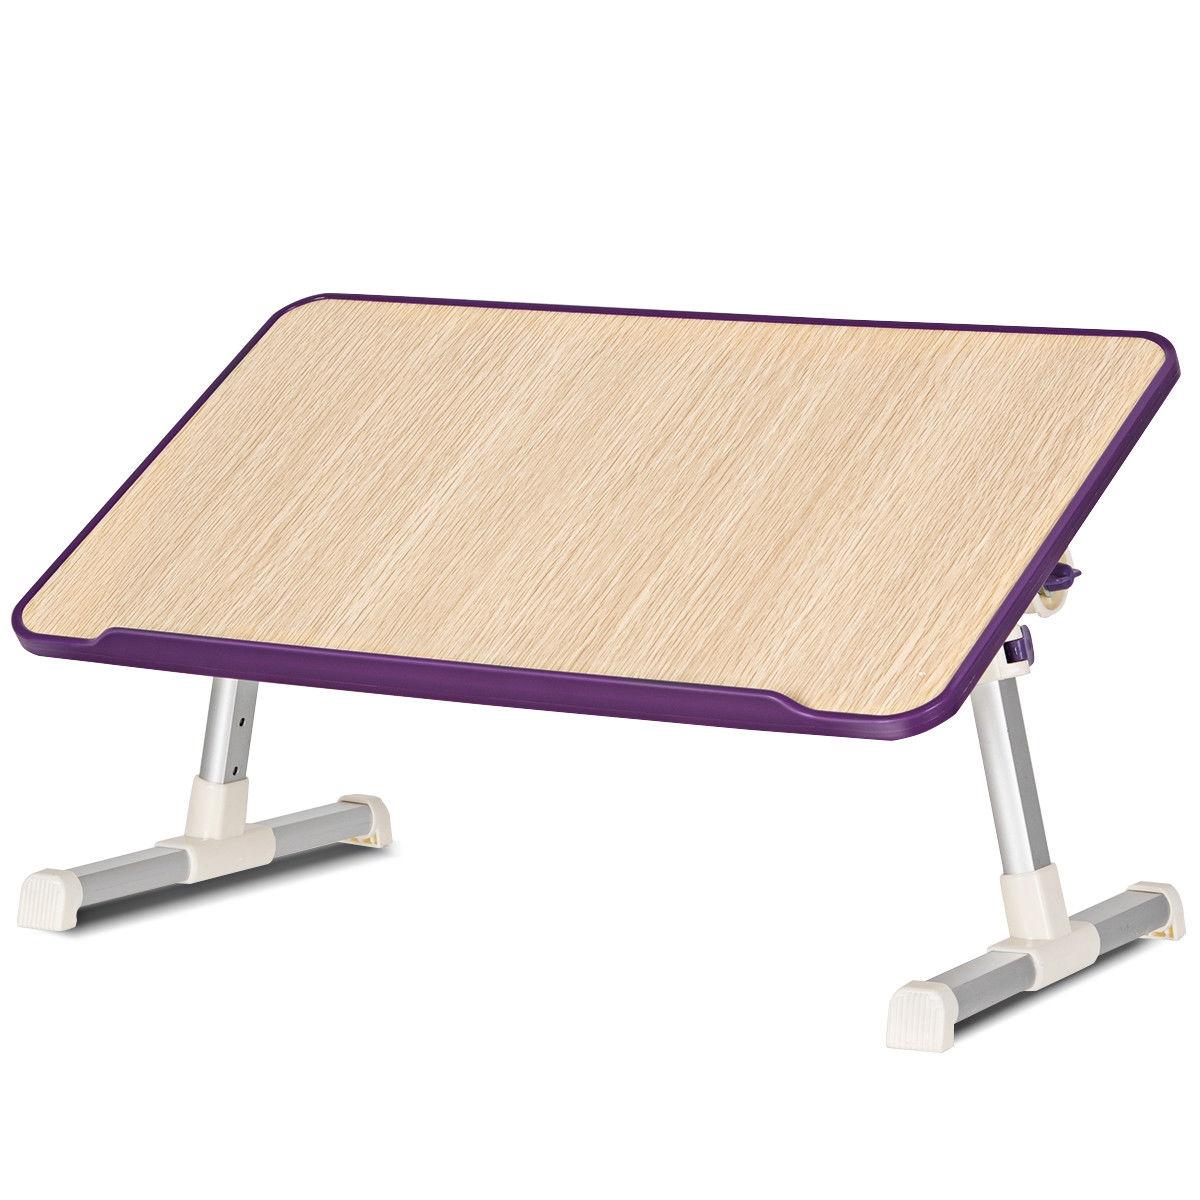 Portable Adjustable Desk Folding Lazy Laptop Computer Table